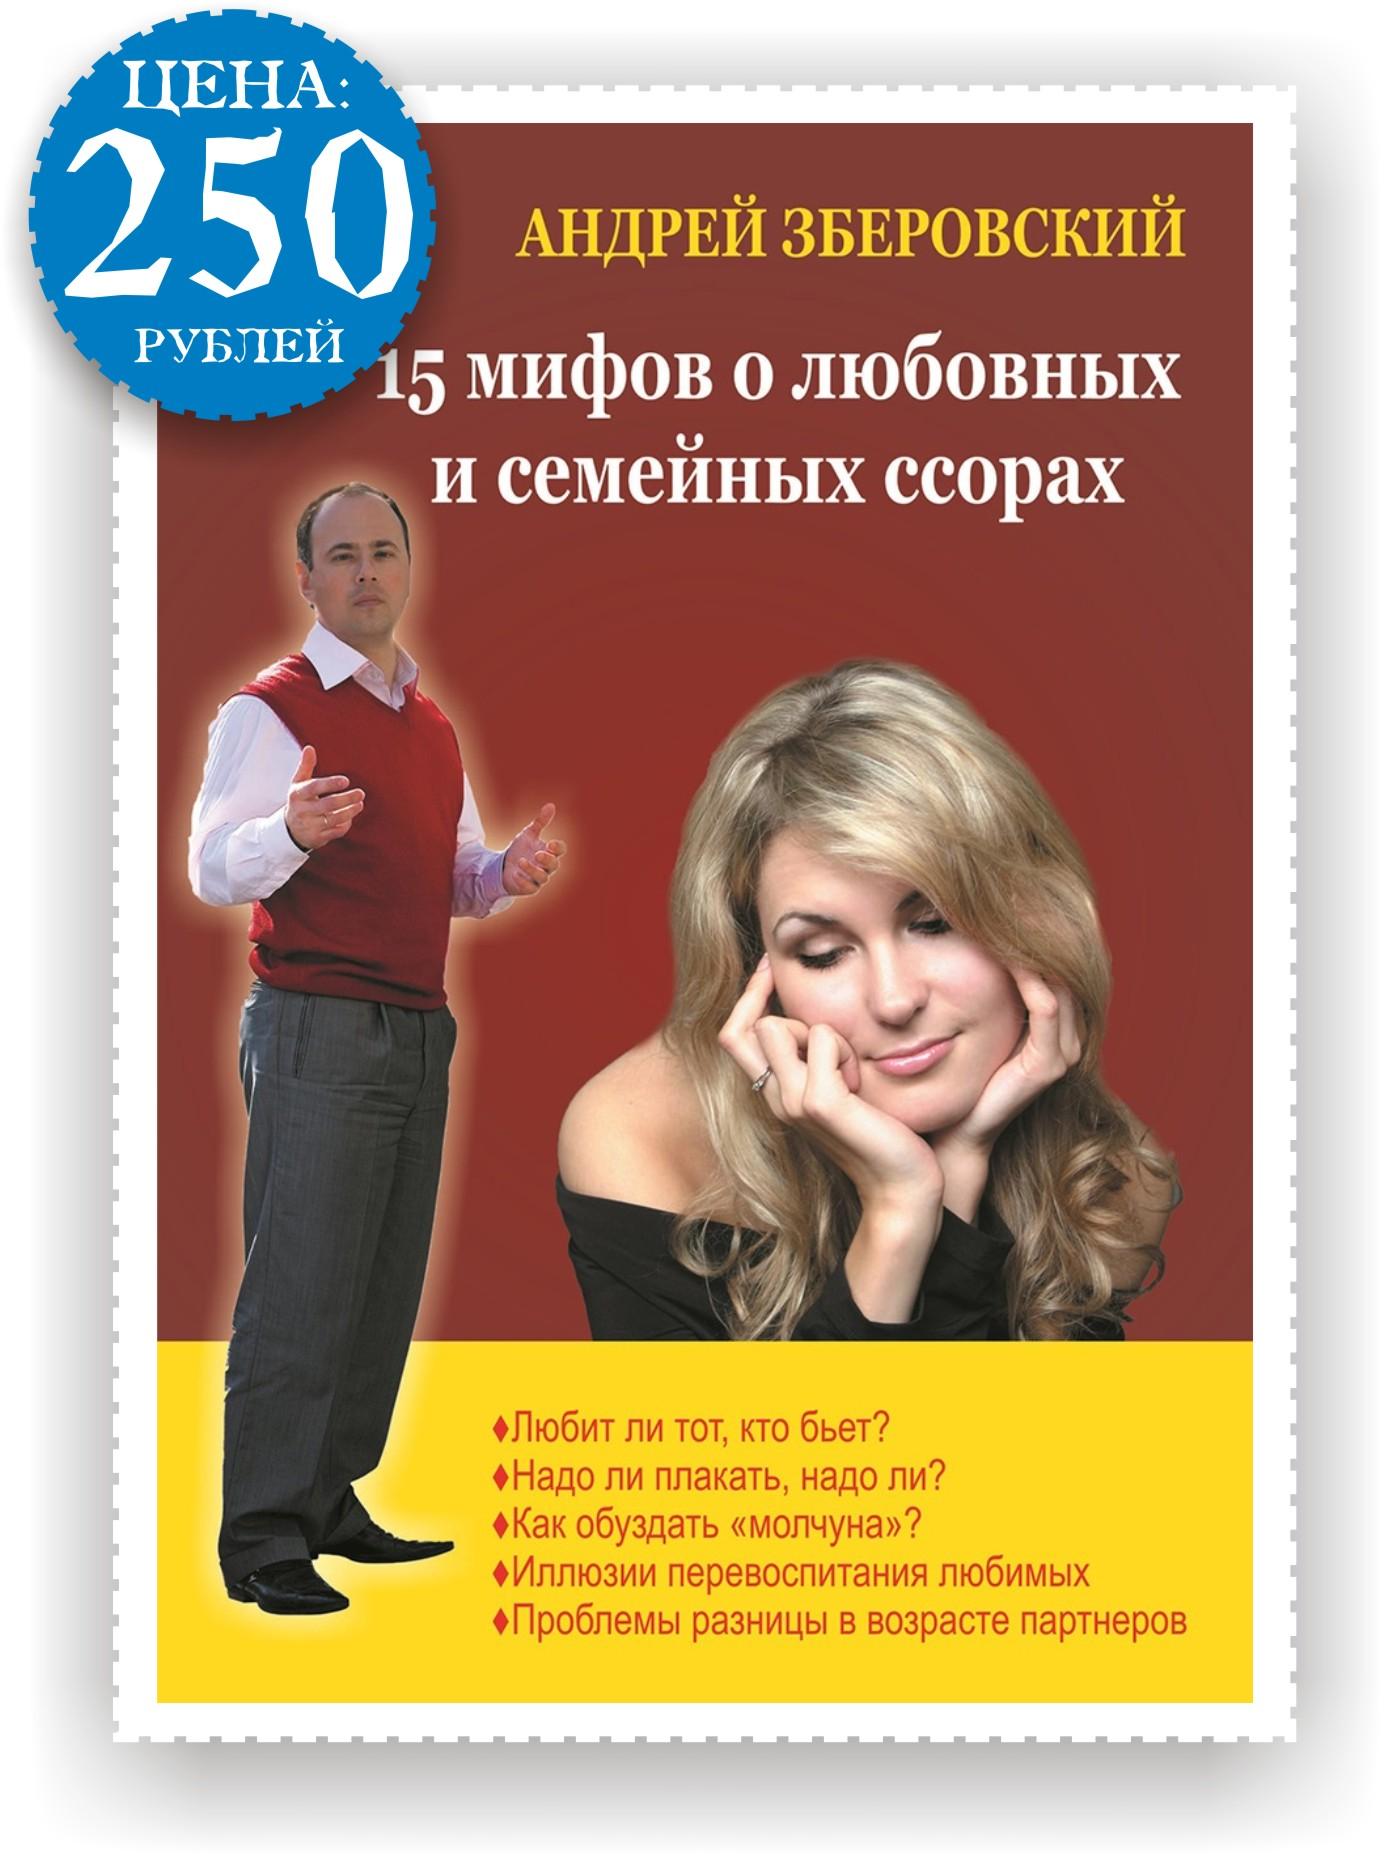 andrey-zberovskiy-muzhskie-seksualnie-s